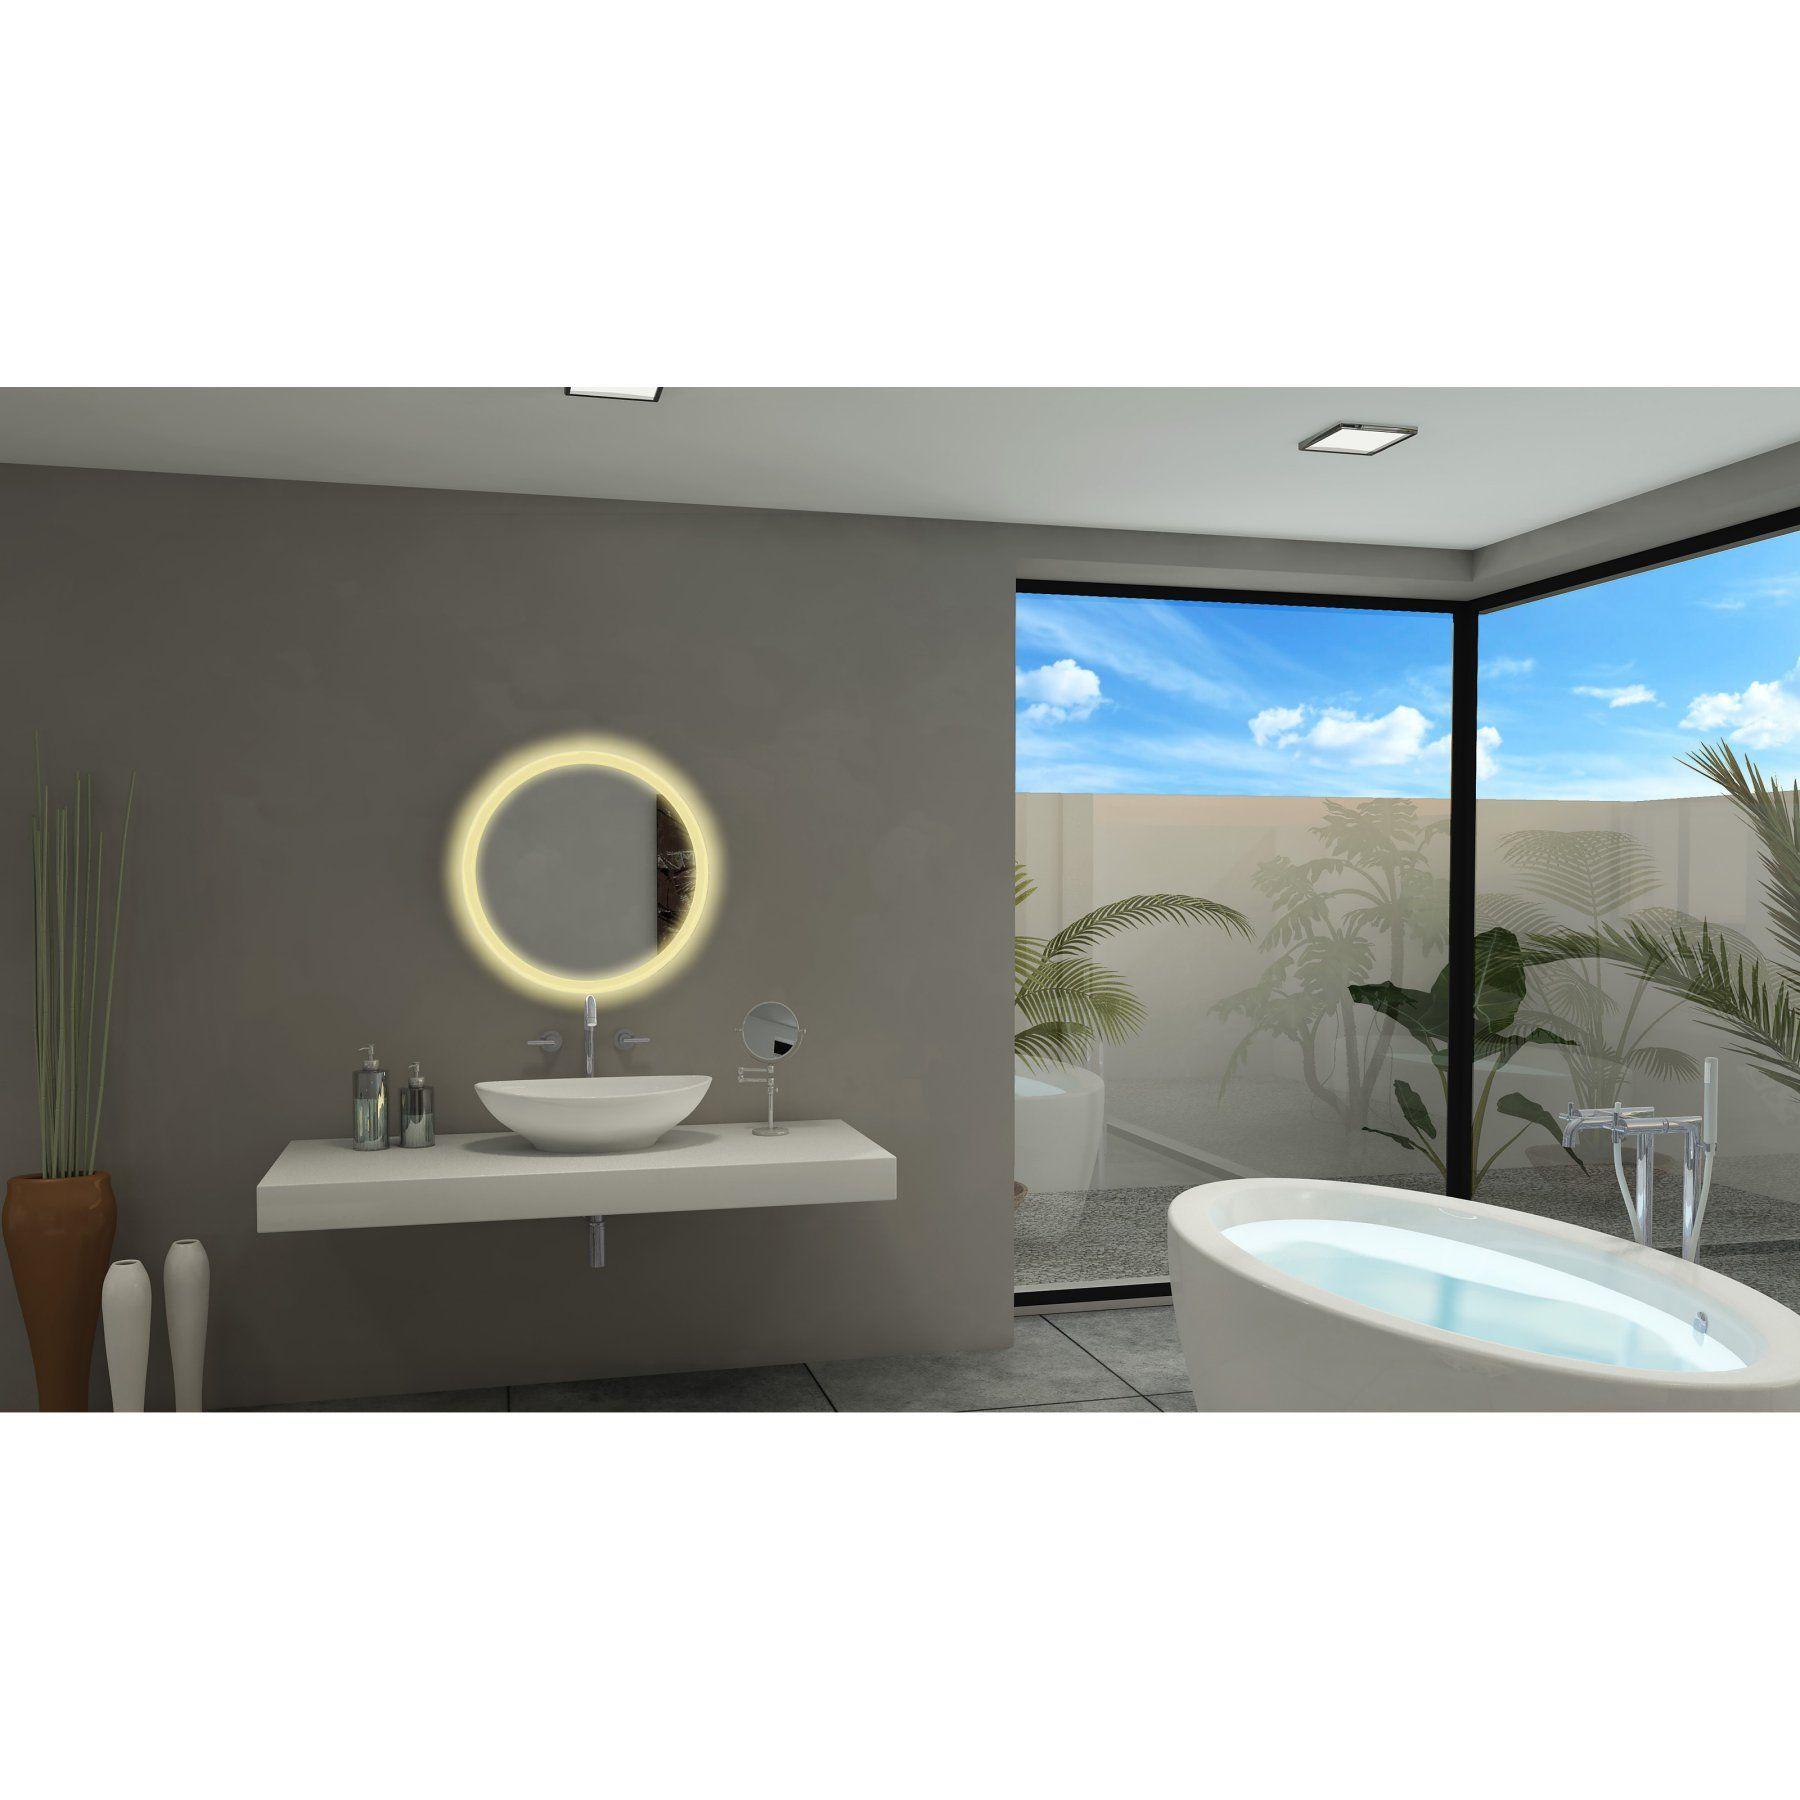 Paris Mirror Round Illuminated Bathroom Wall Mirror - ROUN24243000D ...